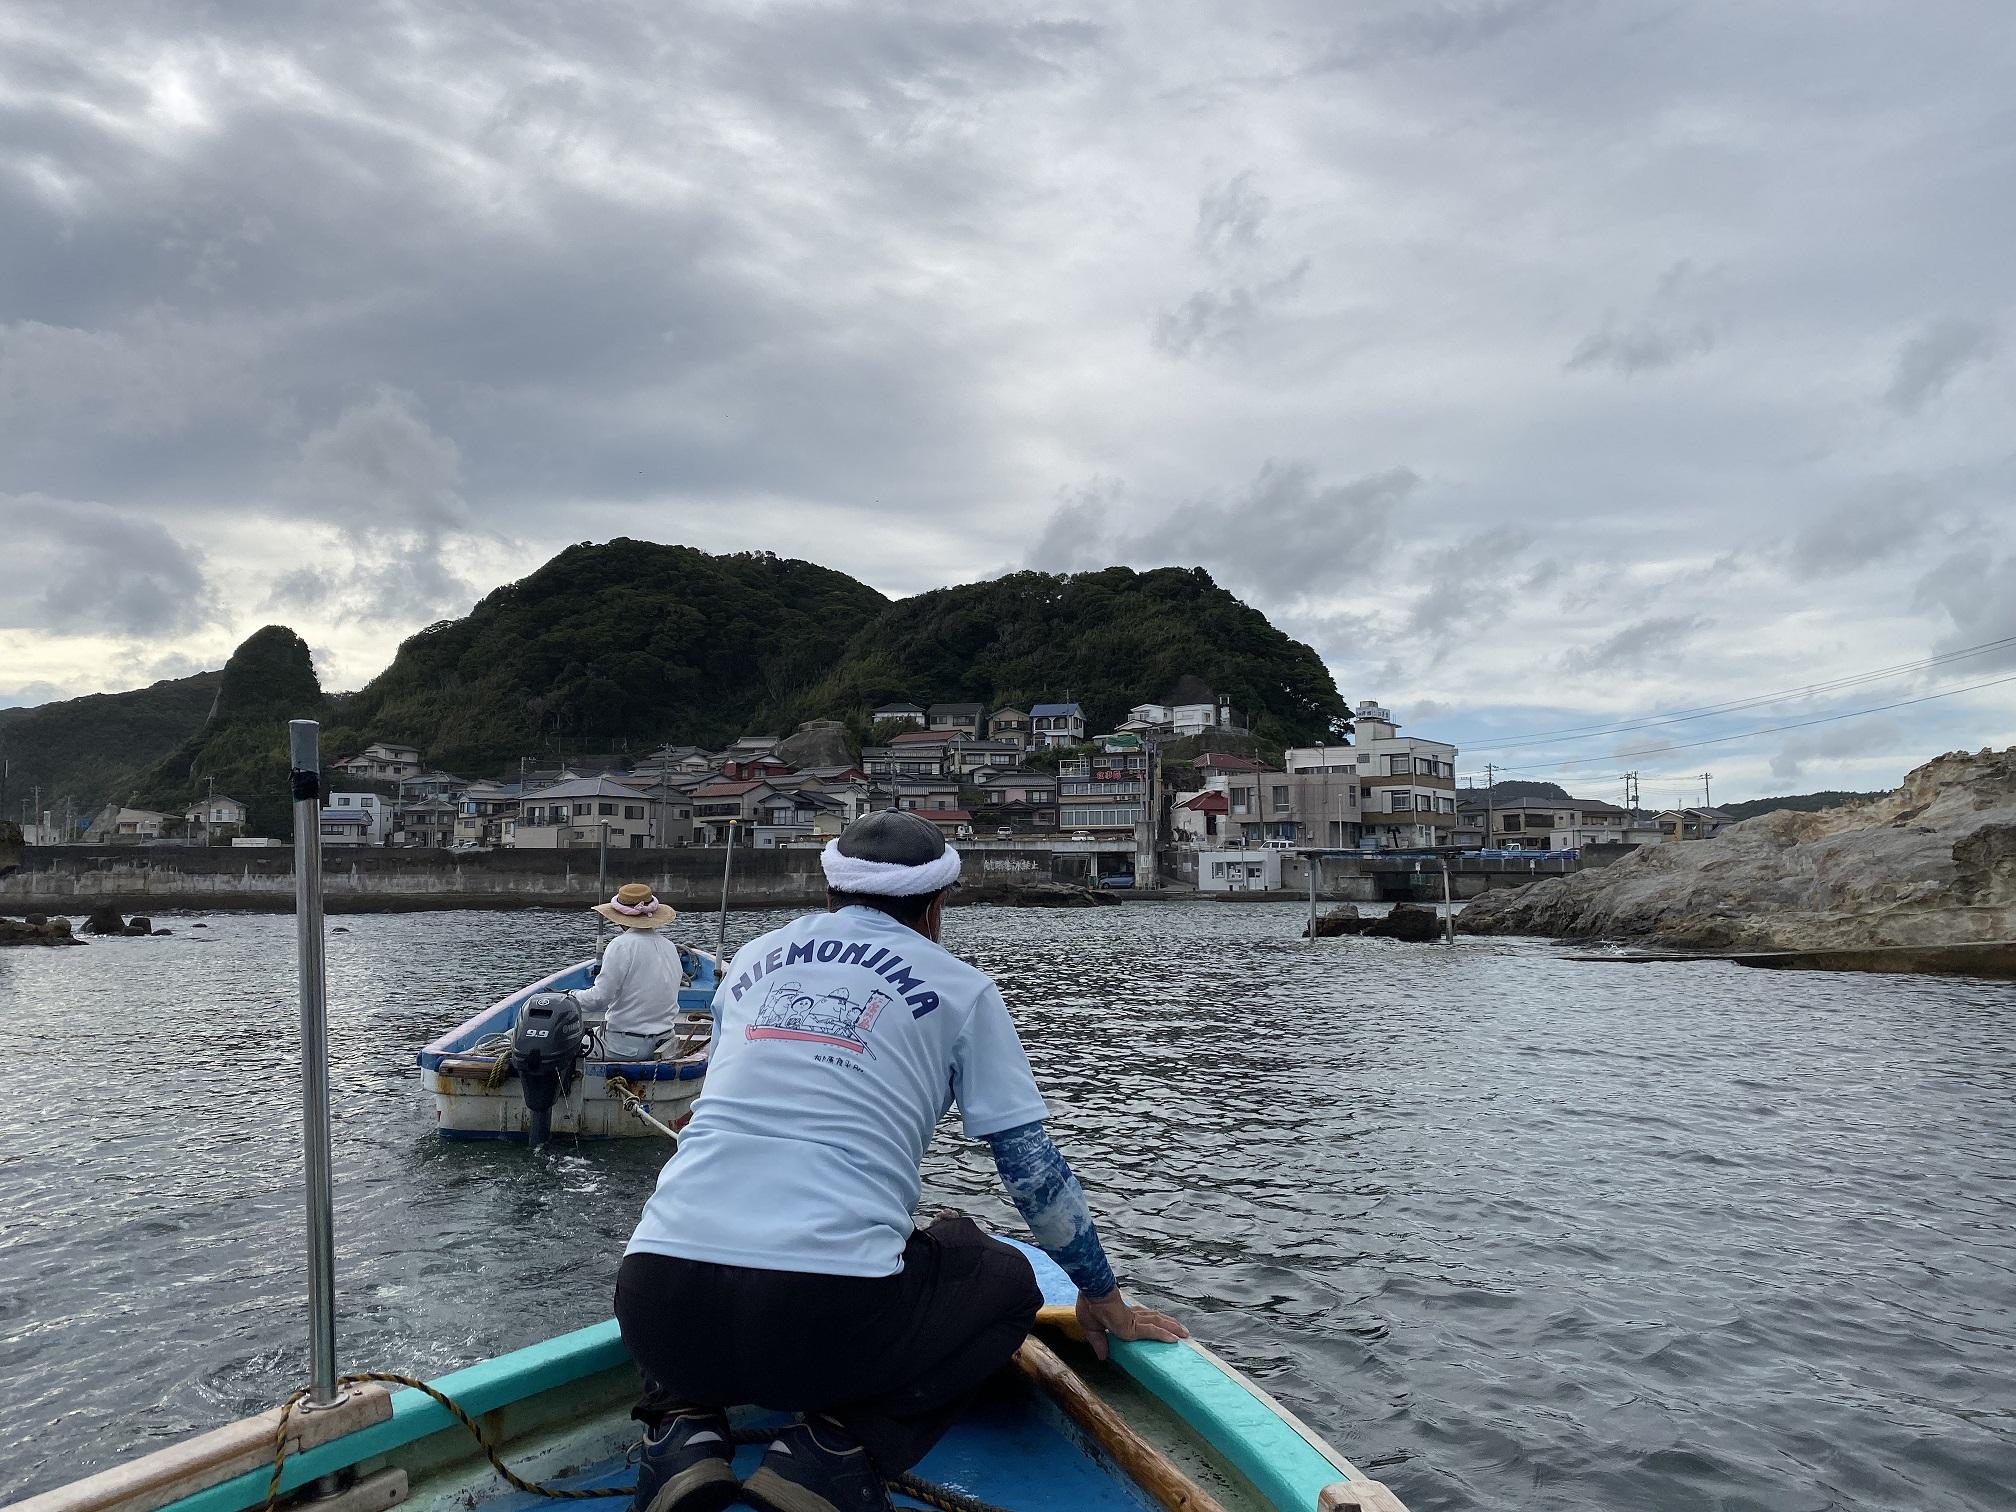 仁右衛門島 渡し舟